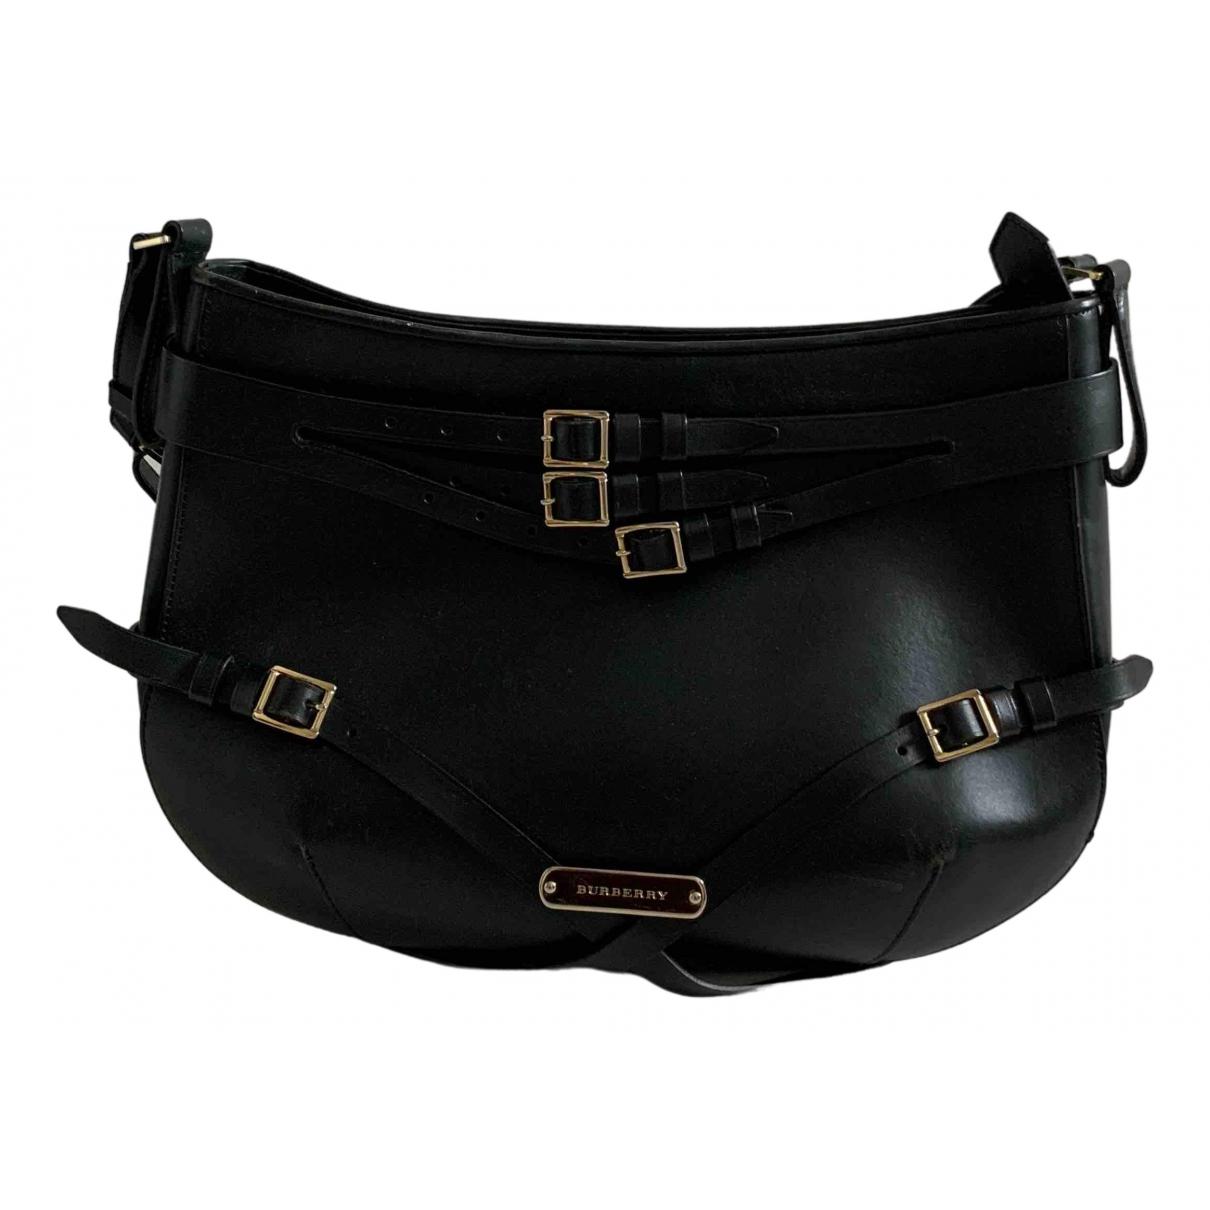 Burberry \N Green Leather handbag for Women \N